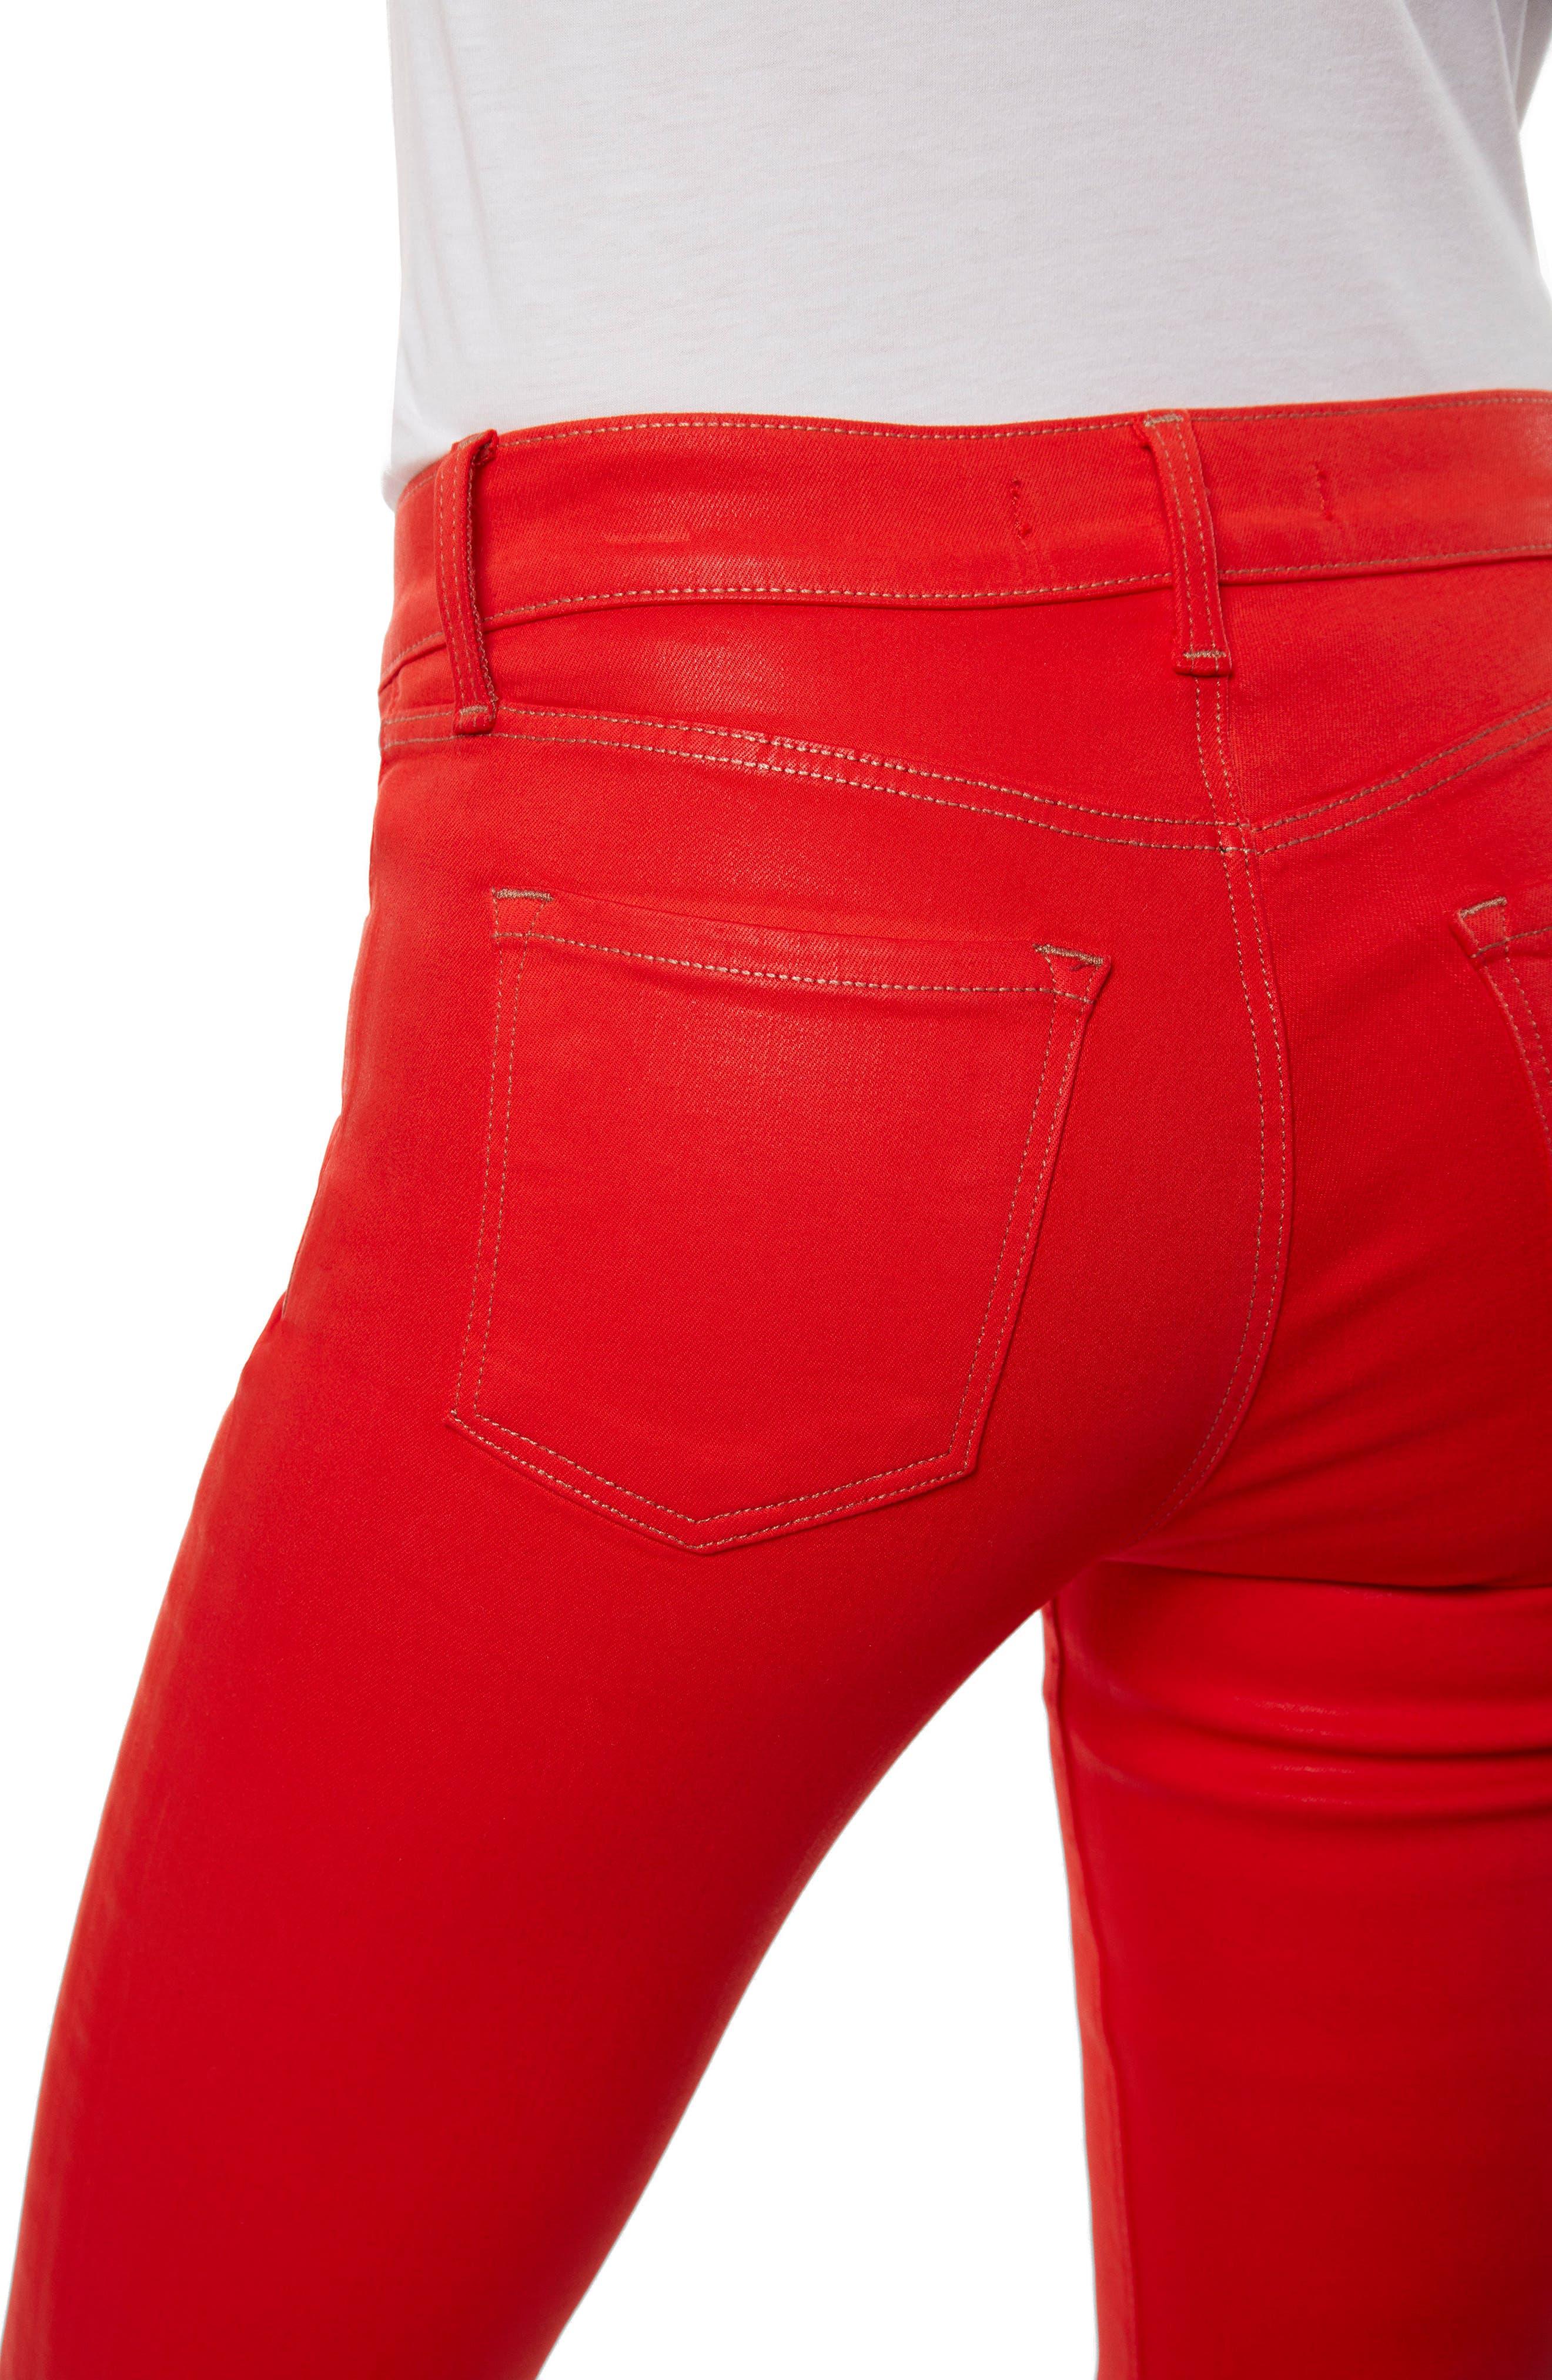 Super Skinny Jeans,                             Alternate thumbnail 14, color,